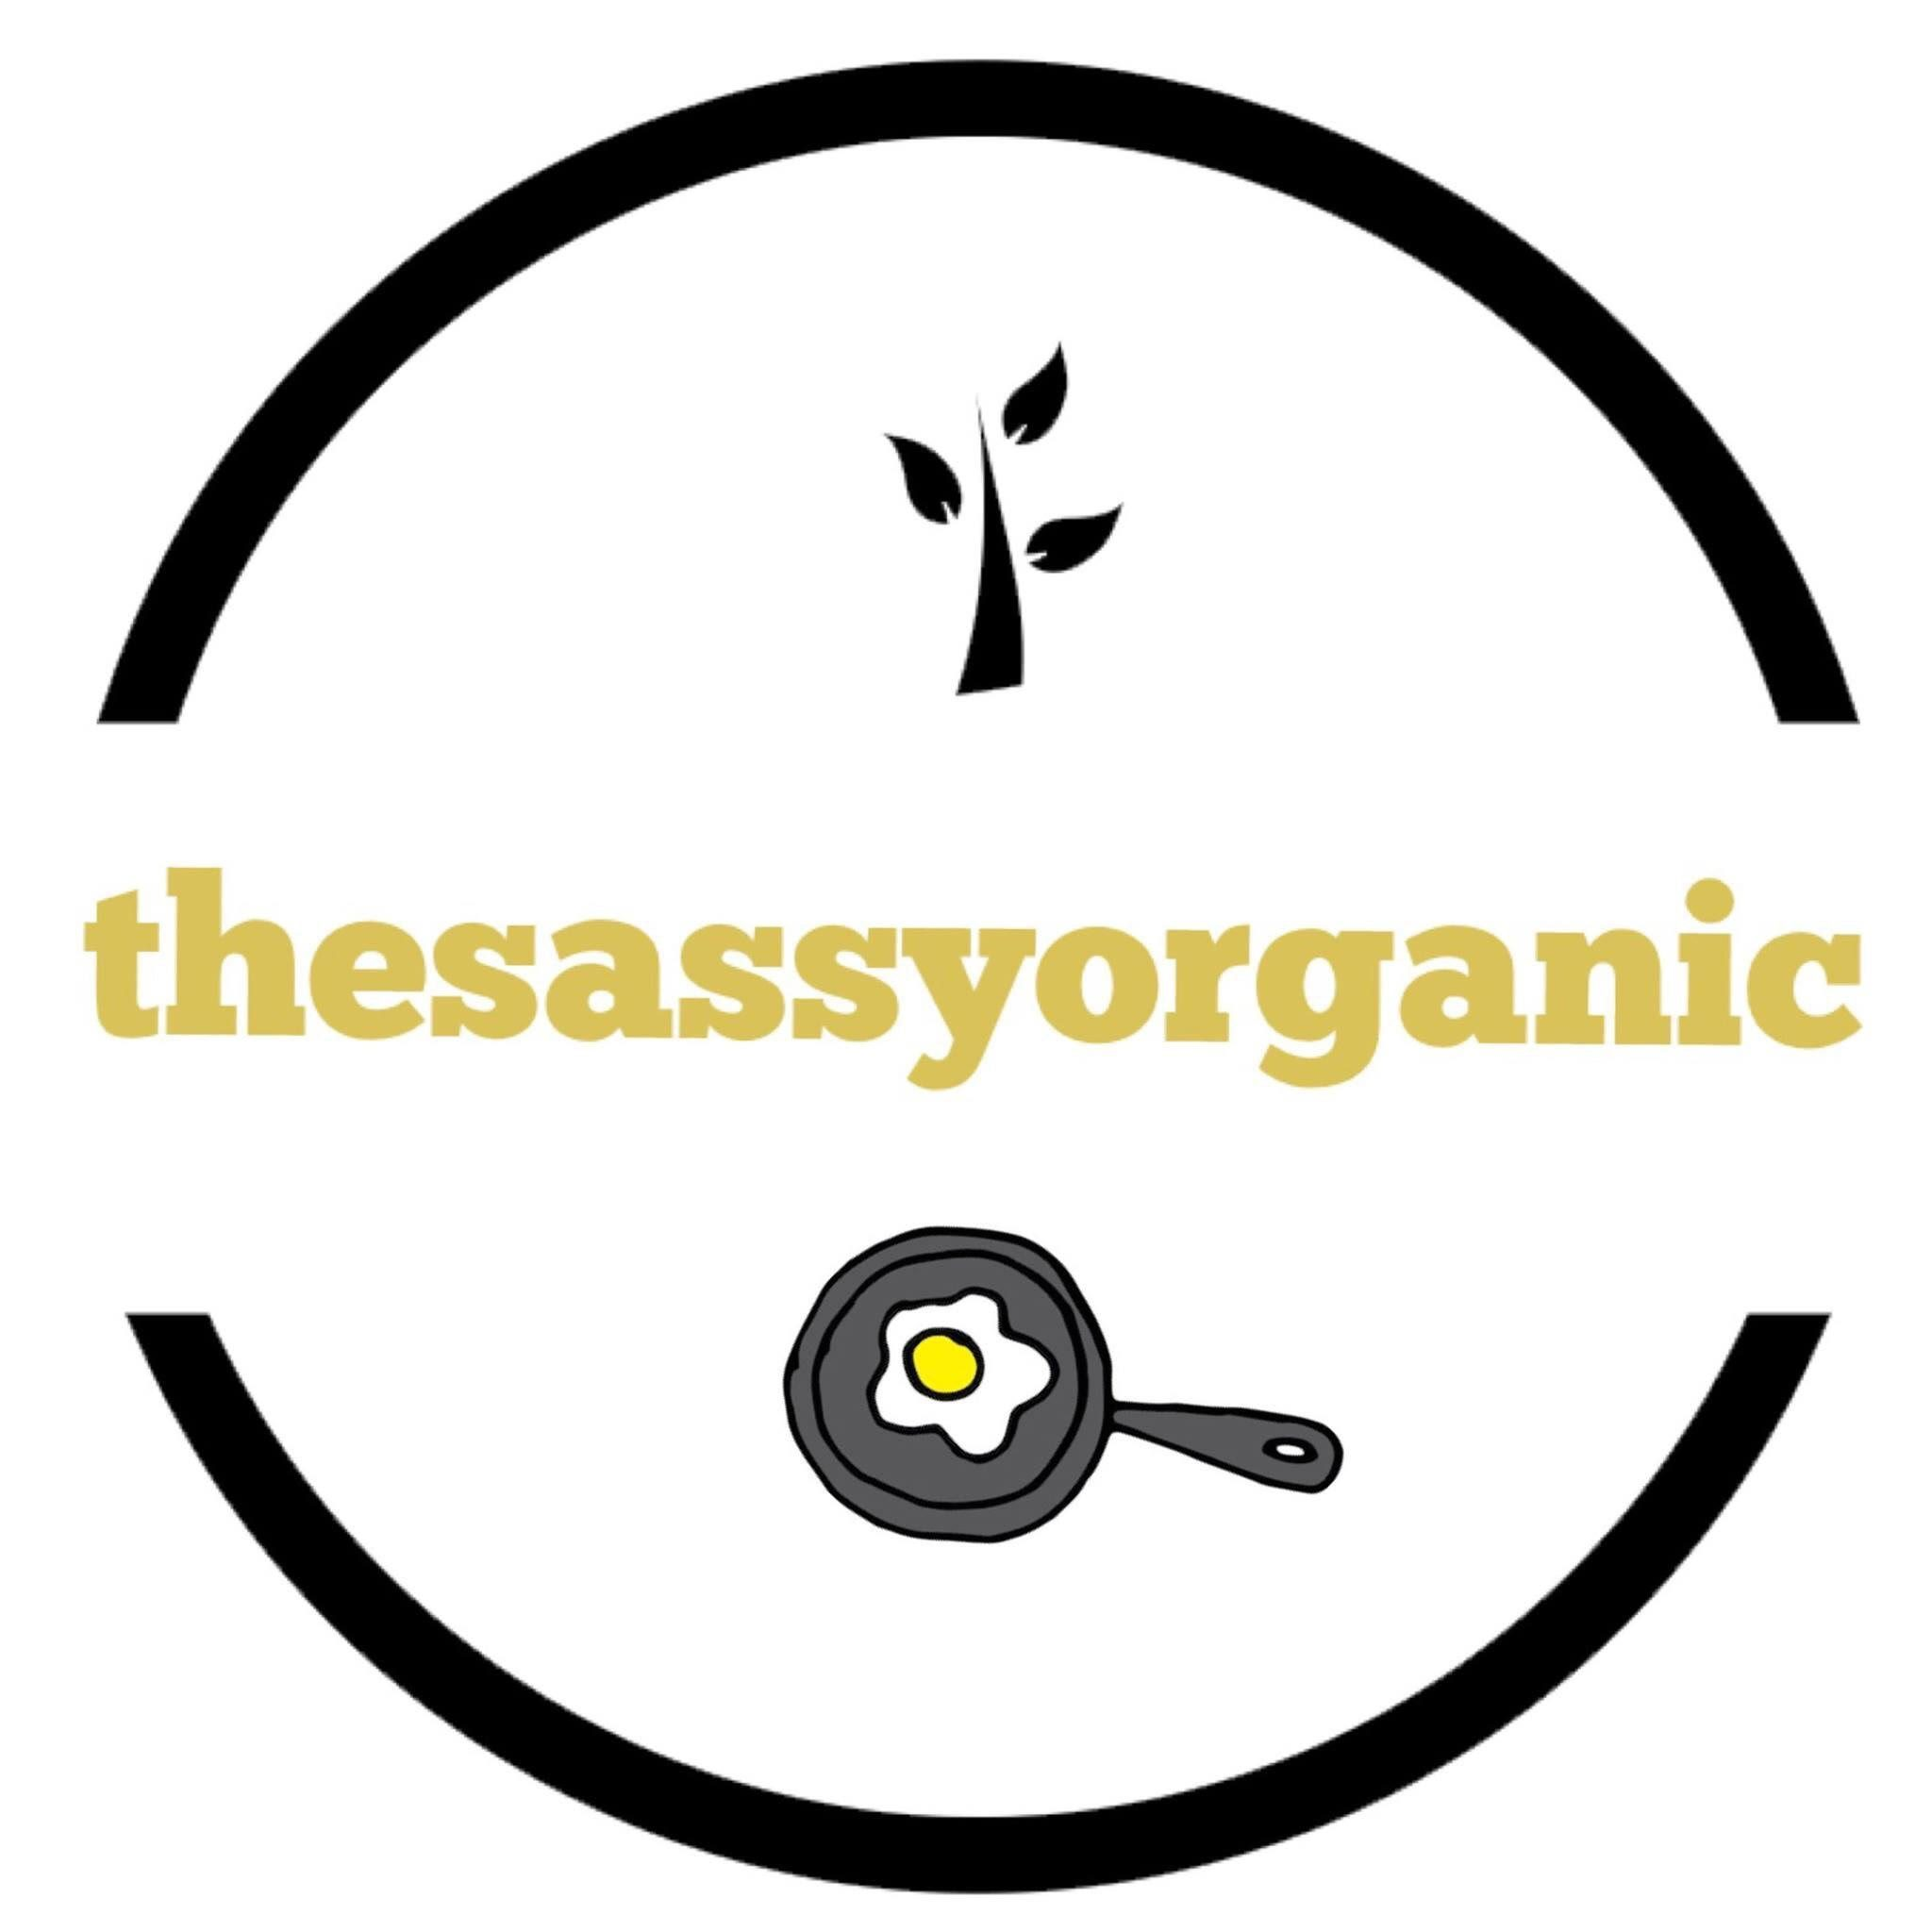 thesassyorganic